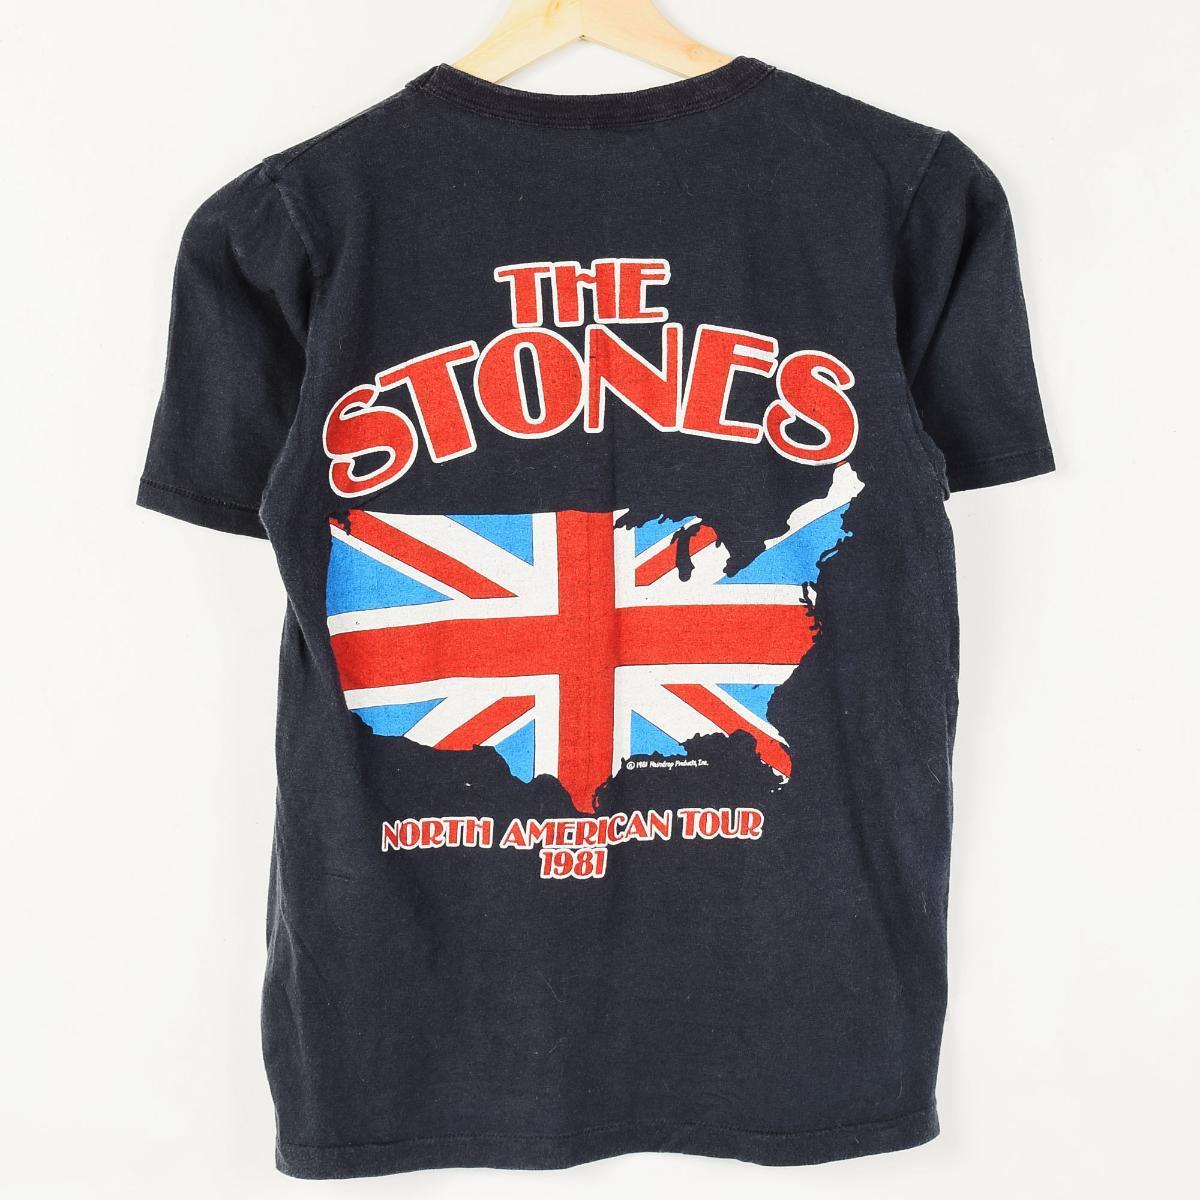 80年代THE ROLLING STONES zaroringusutonzu USA制造NORTH AMERICAN TOUR 1981带T恤人XS复古/wer4624 160601